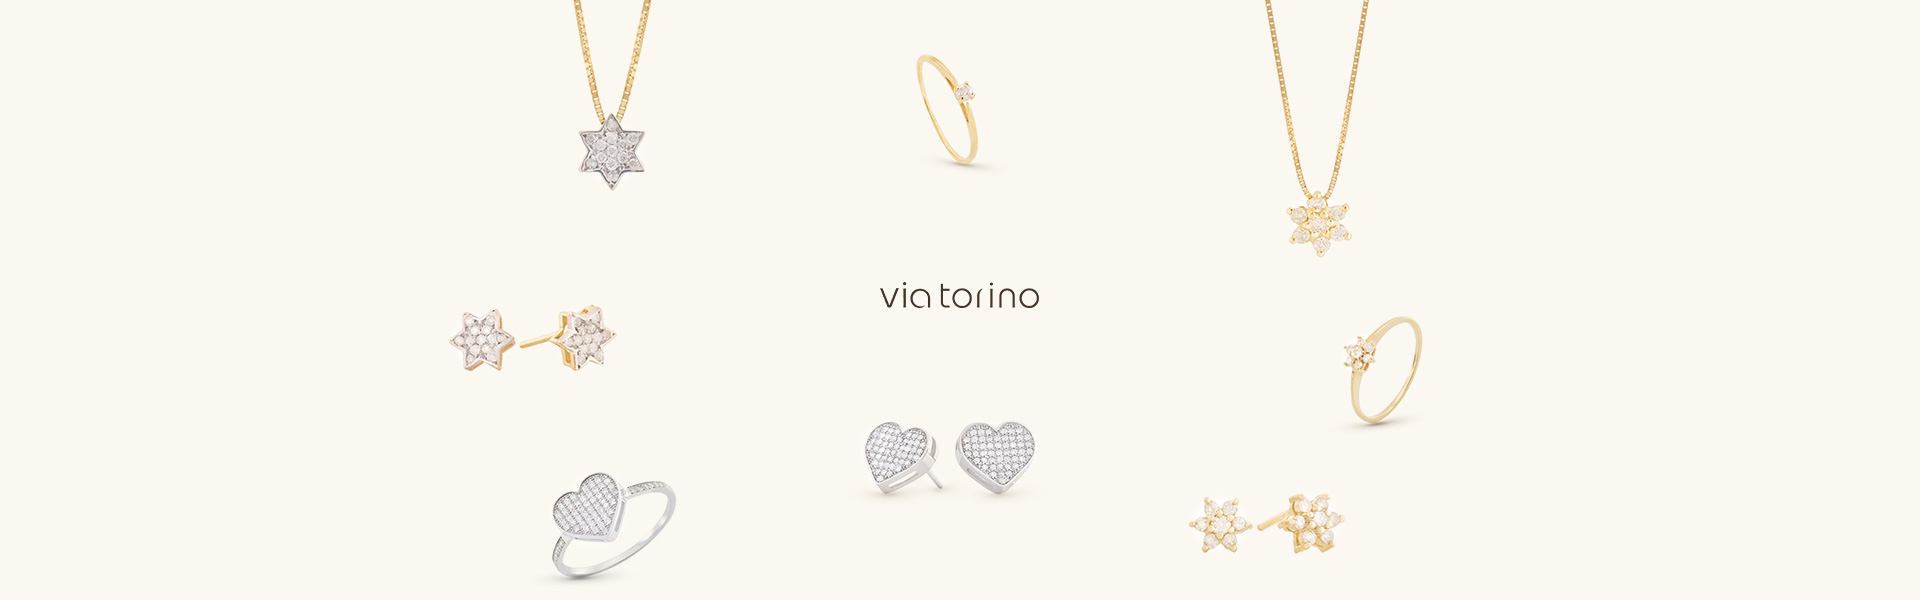 banner_viatorino